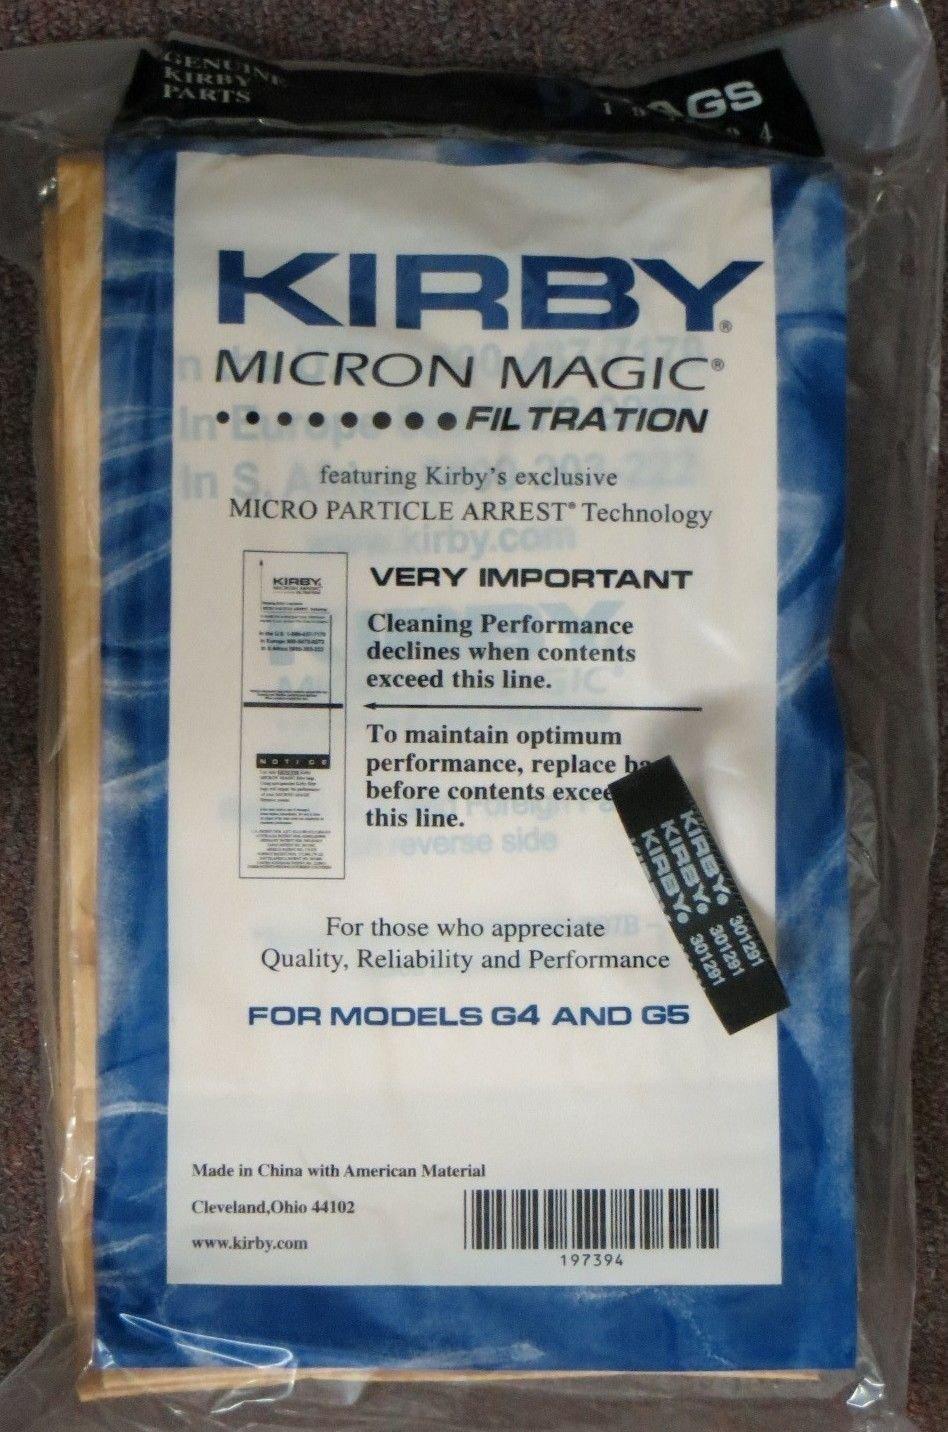 6 Belts 9 Sentria Micron Magic Kirby G3-6 UG Vacuum Bags BRAND NEW PRODUCT!!!!!